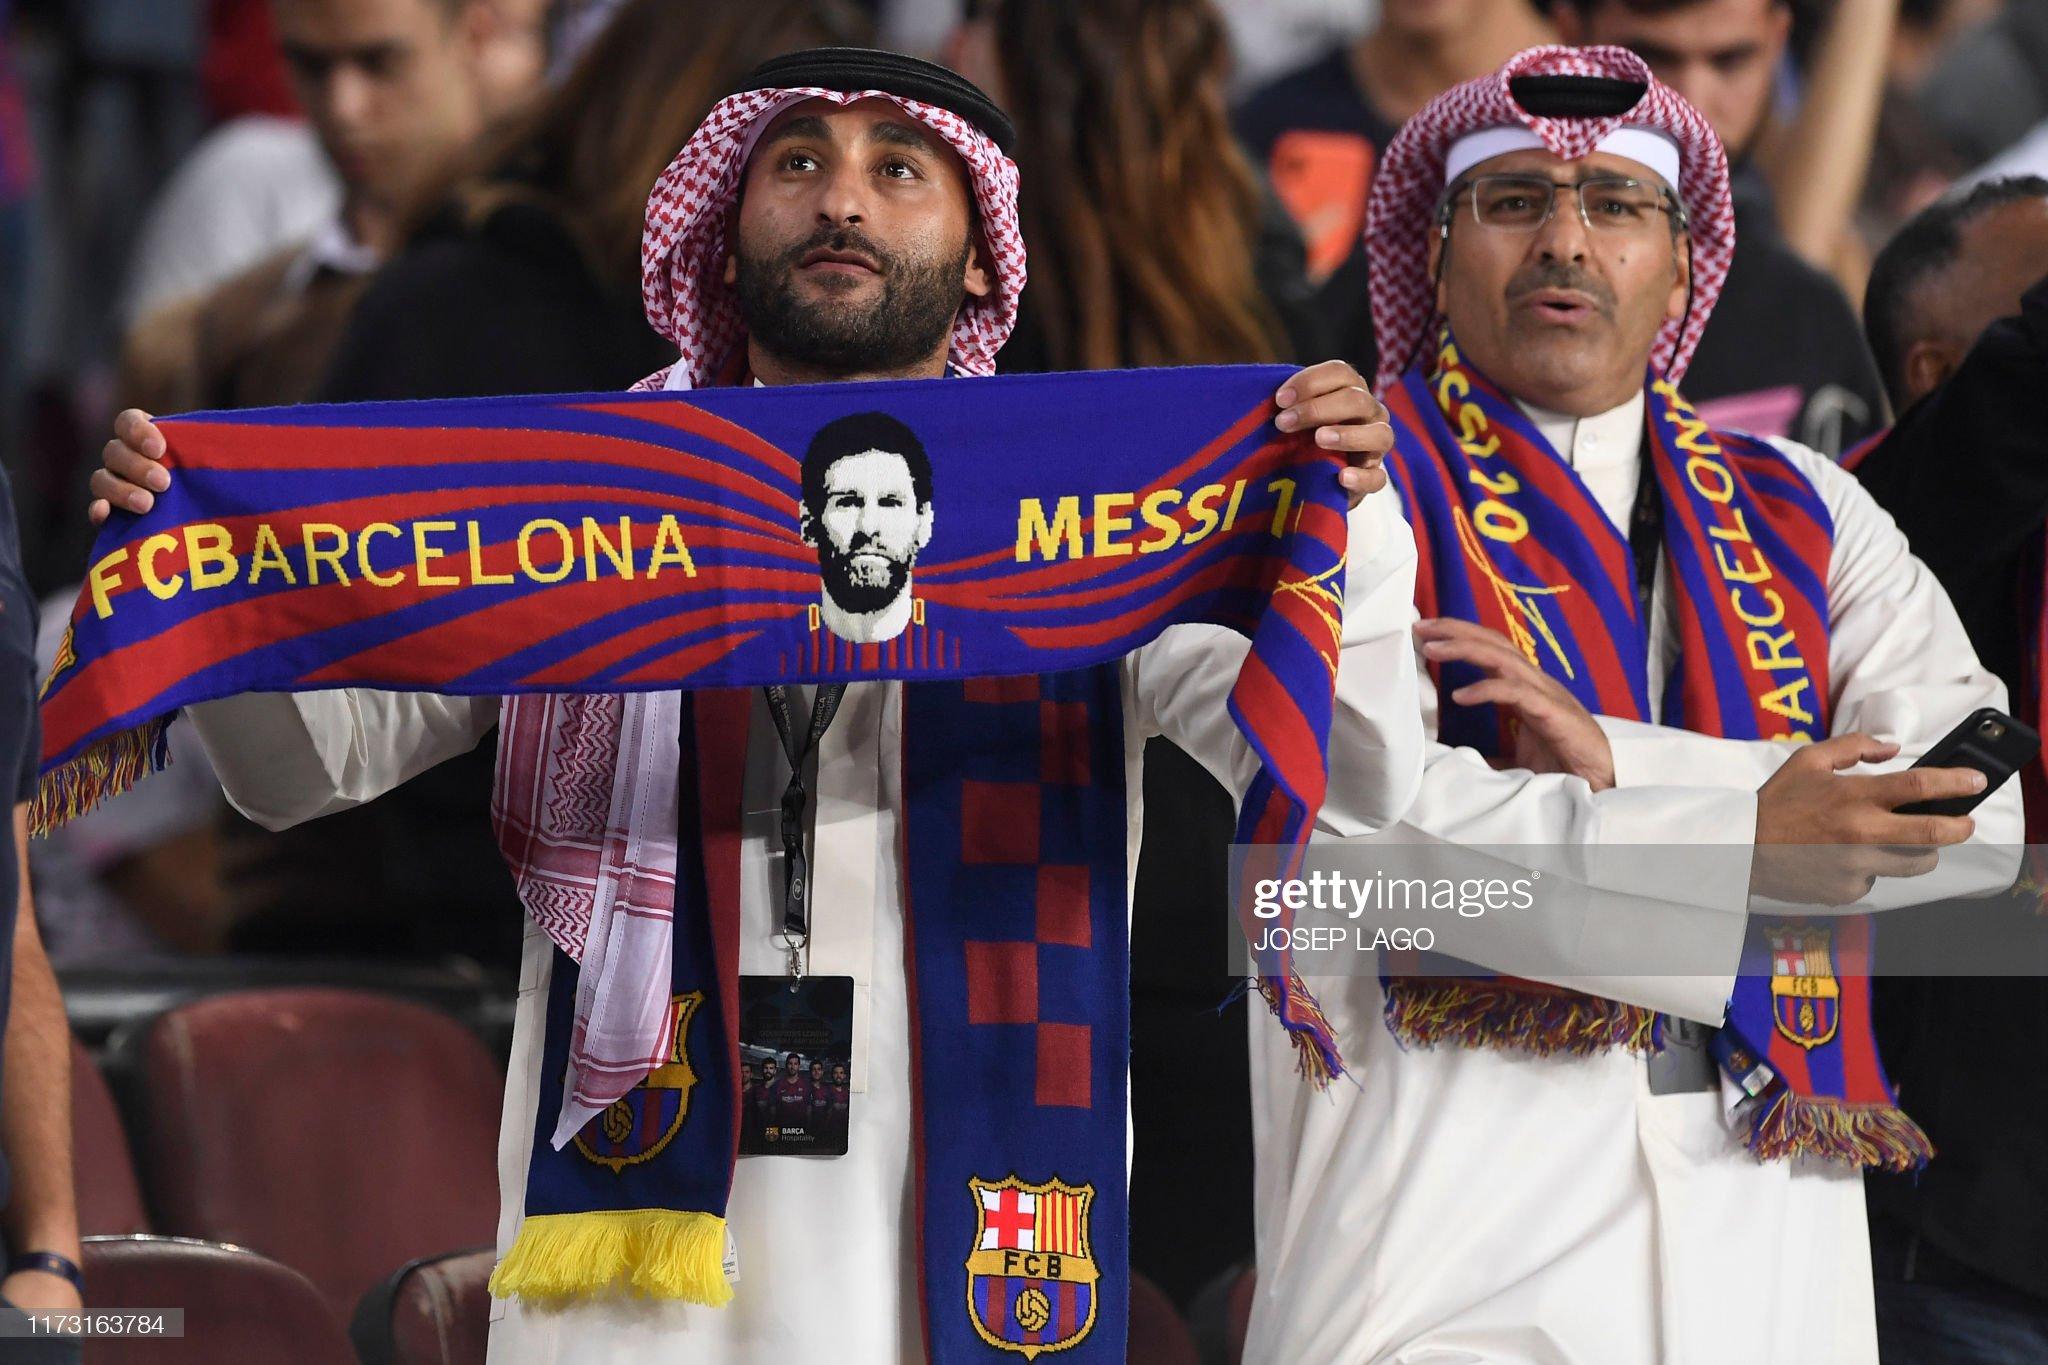 صور مباراة : برشلونة - إنتر 2-1 ( 02-10-2019 )  Barcelona-fan-holds-a-scarf-depicting-barcelonas-argentine-forward-picture-id1173163784?s=2048x2048